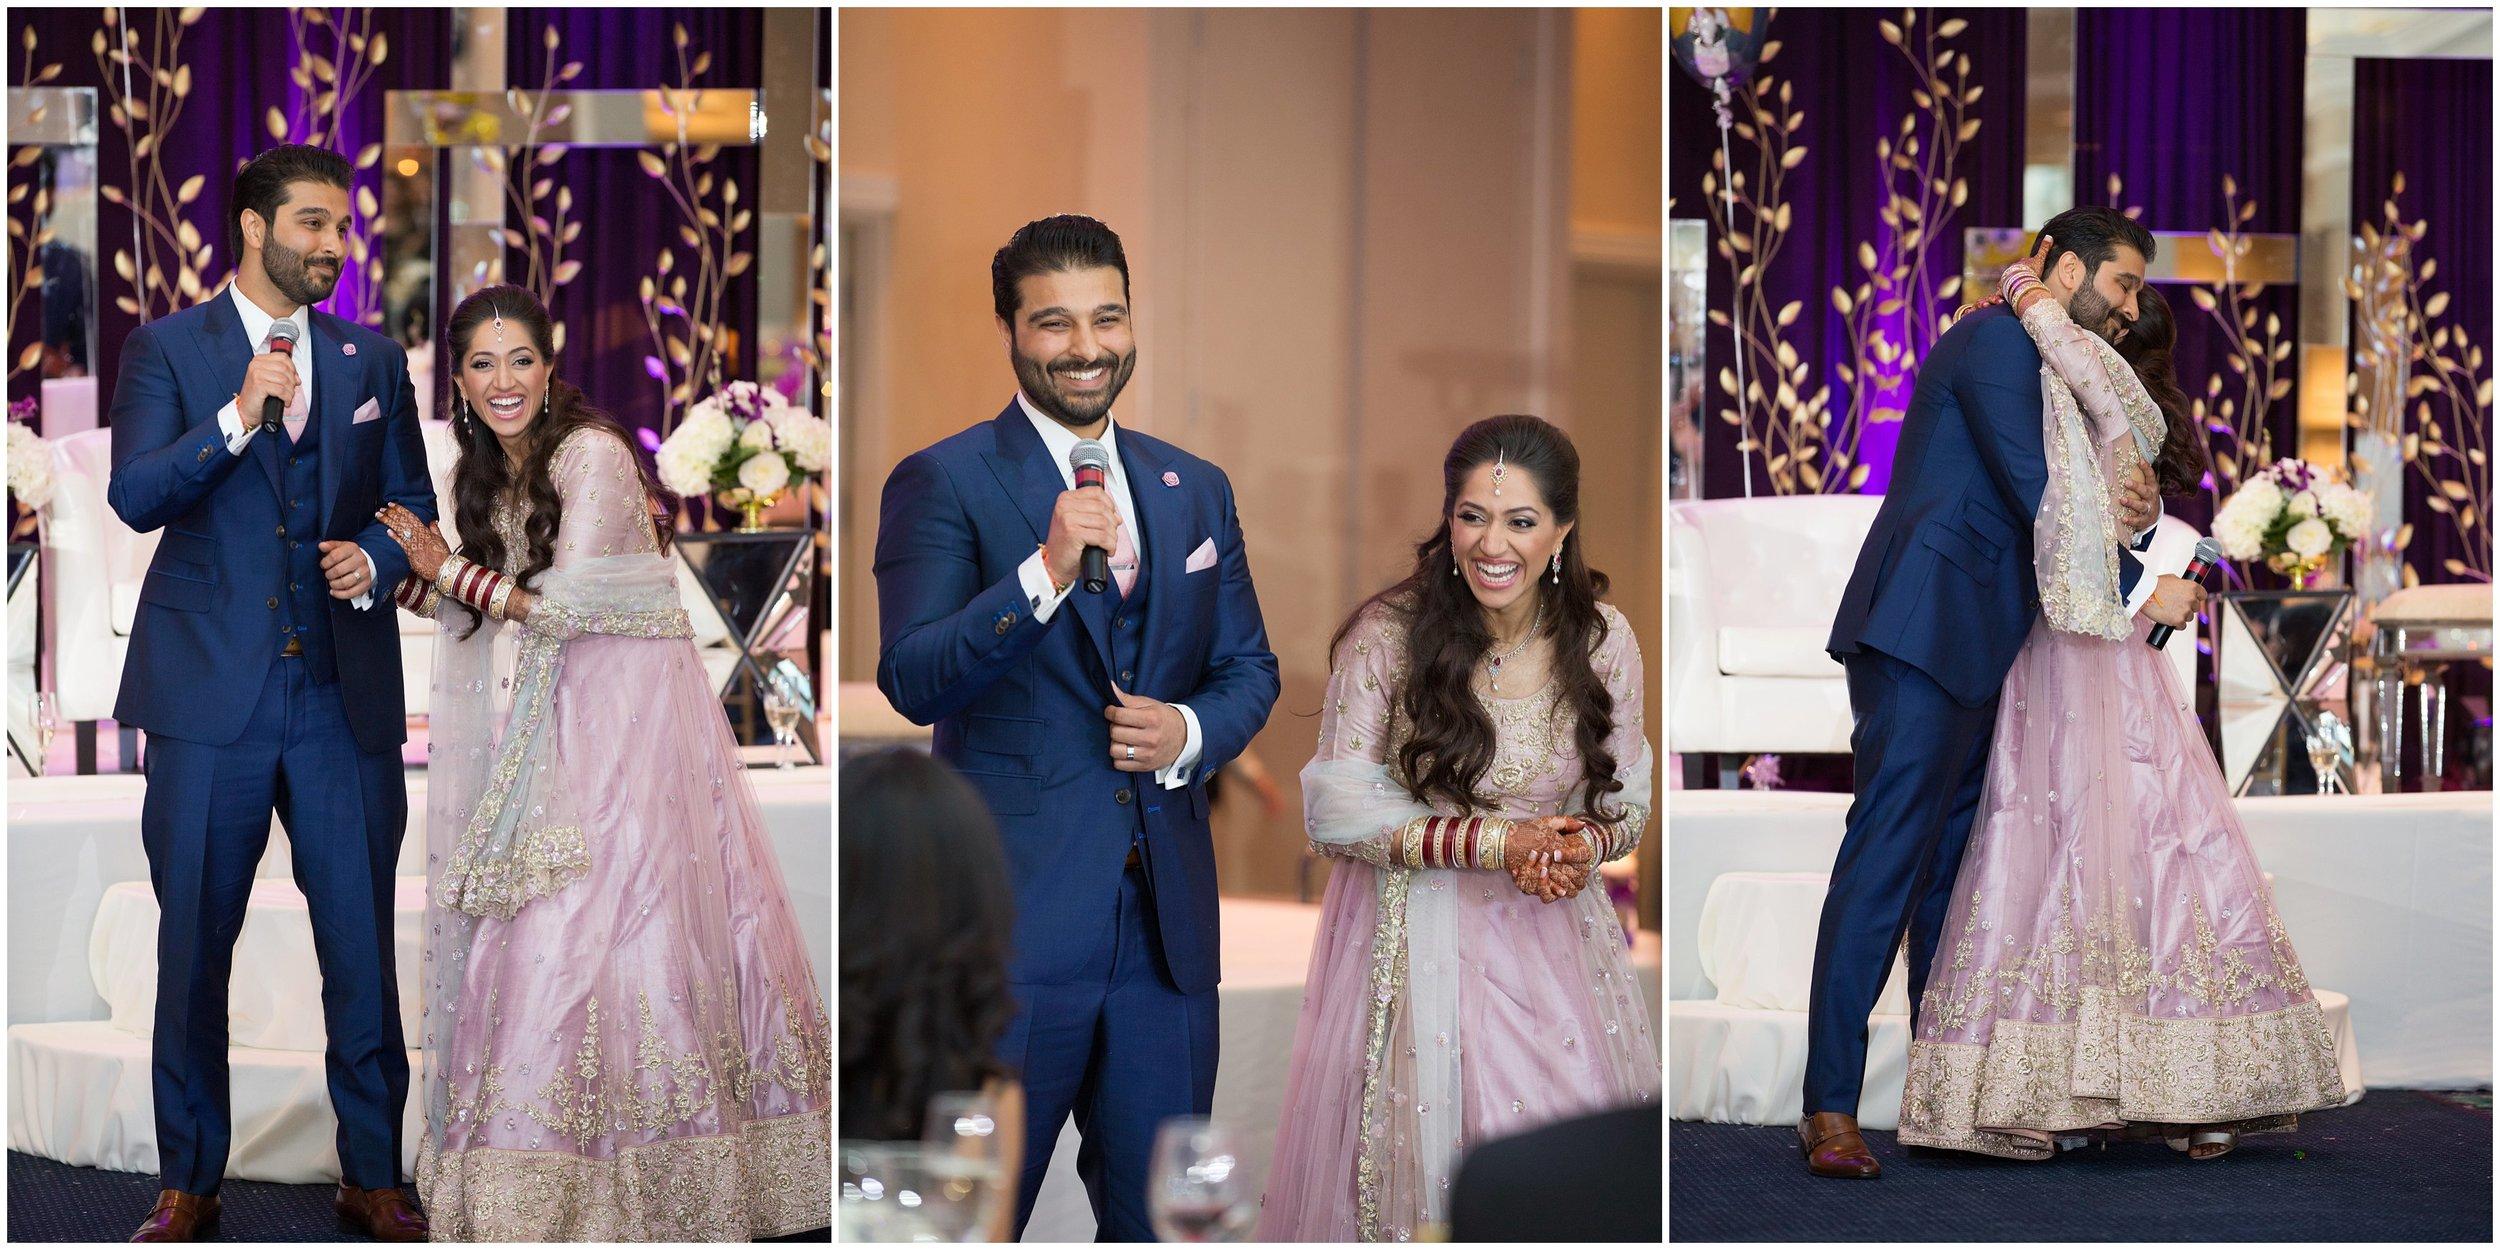 Le Cape Weddings - South Asian Wedding in Illinois - Tanvi and Anshul -1449_LuxuryDestinationPhotographer.jpg